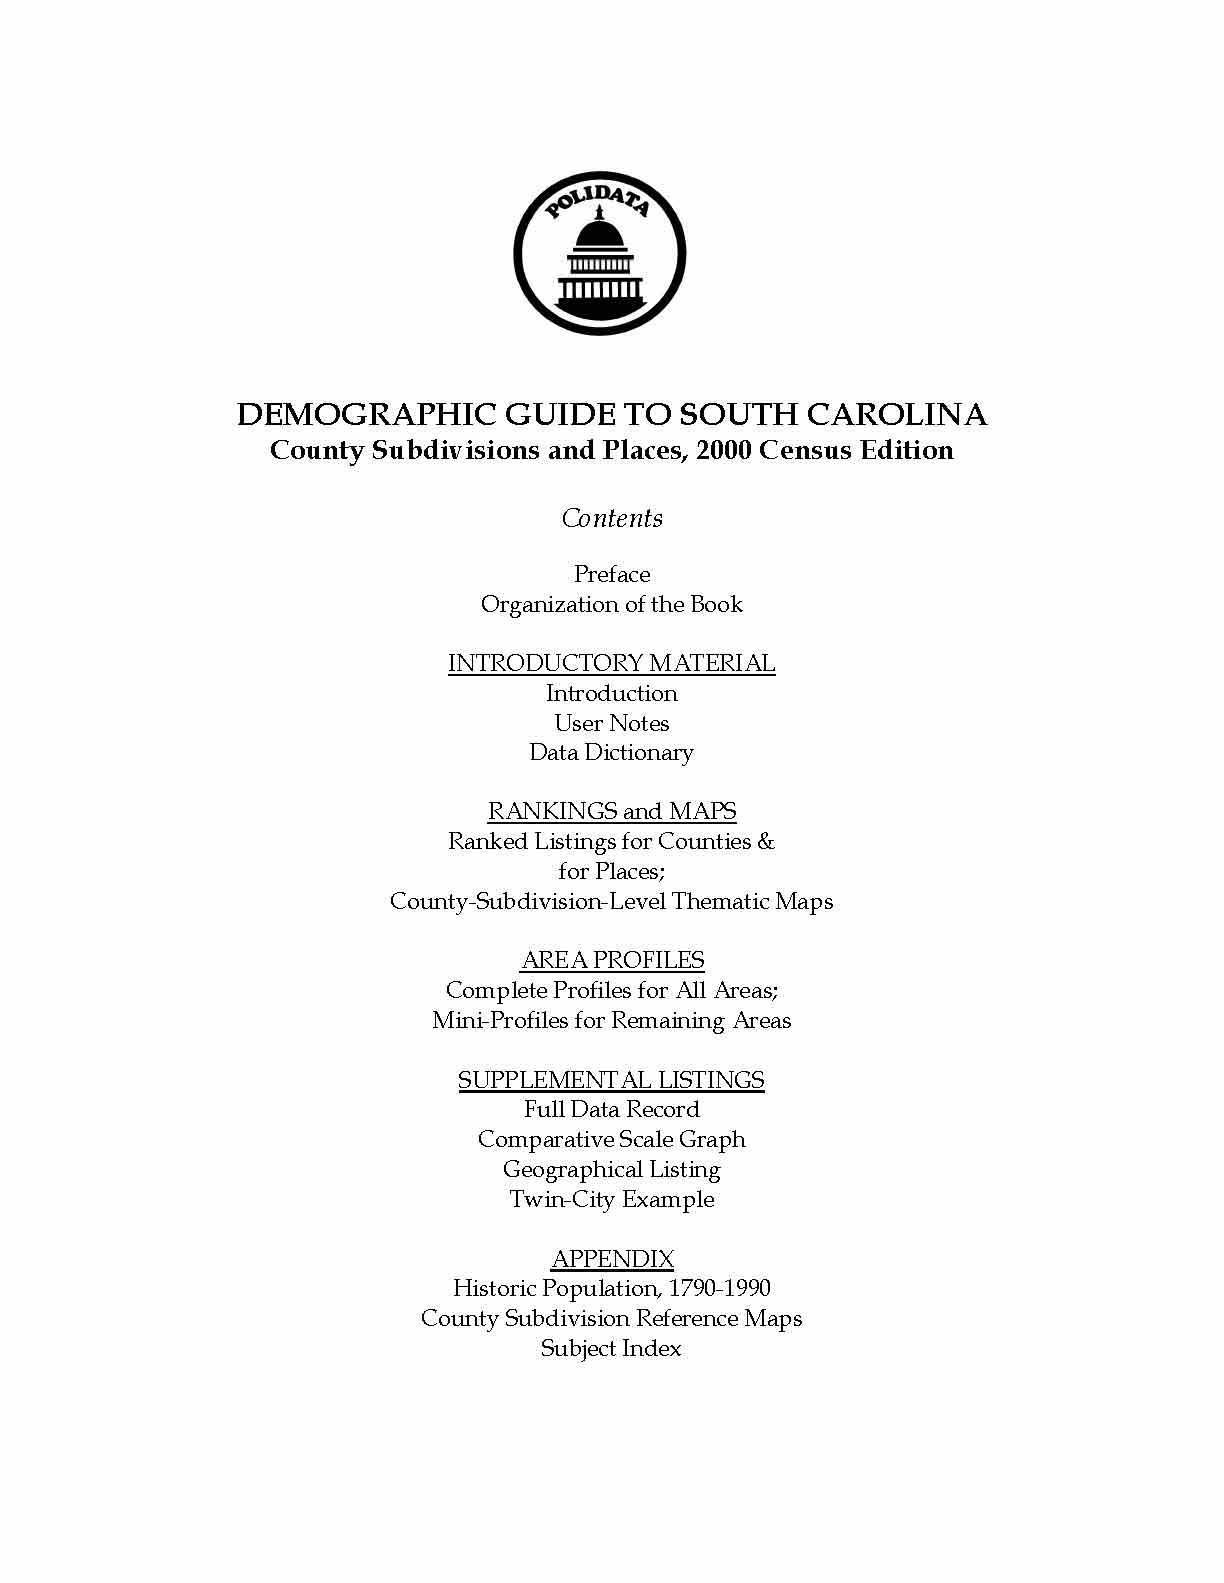 Polidata South Carolina Demographic Guide Bibliographic Info